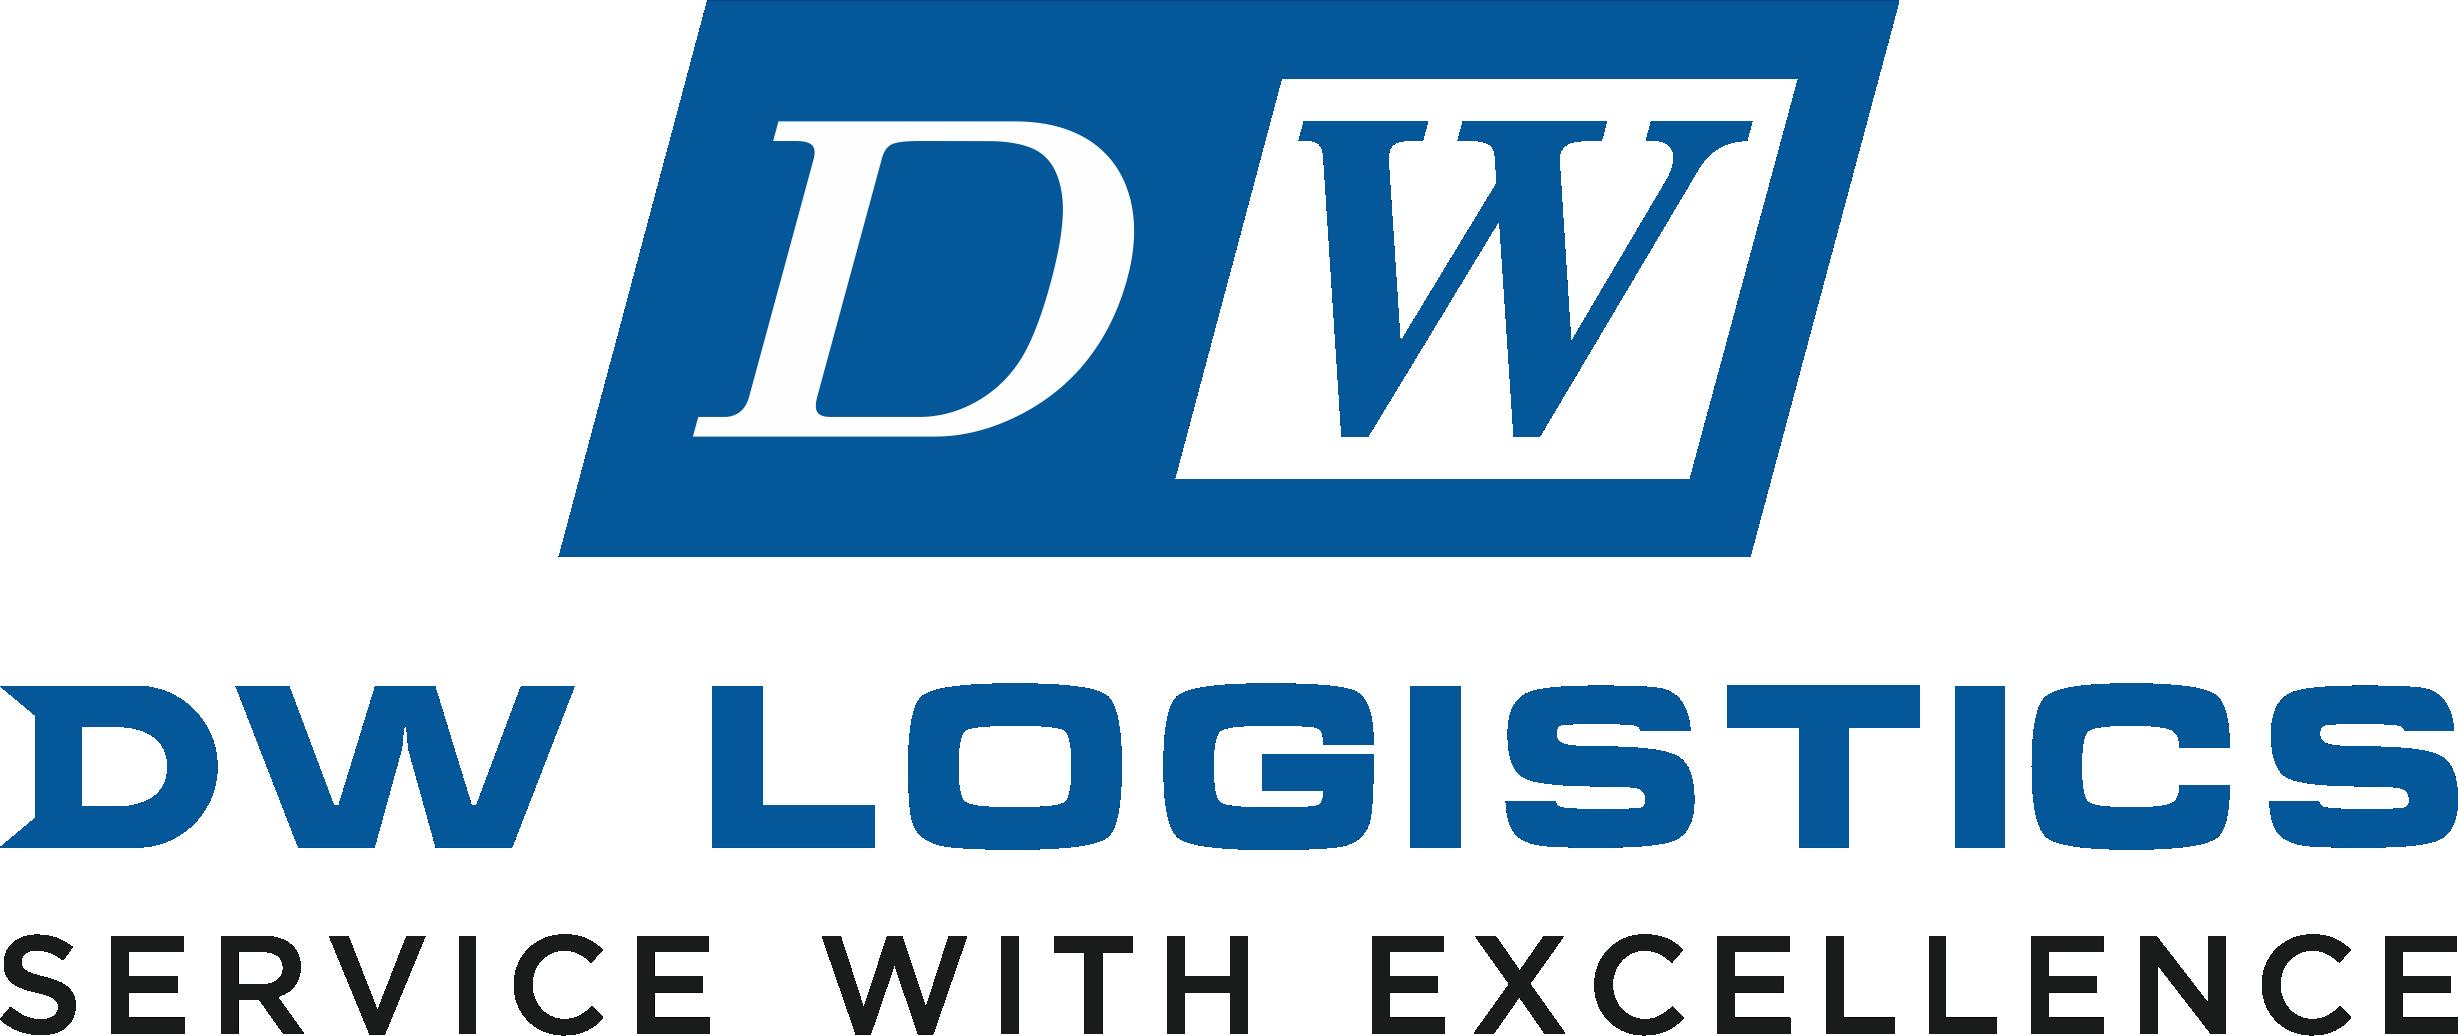 DW Logisitics A premier Trucking Company